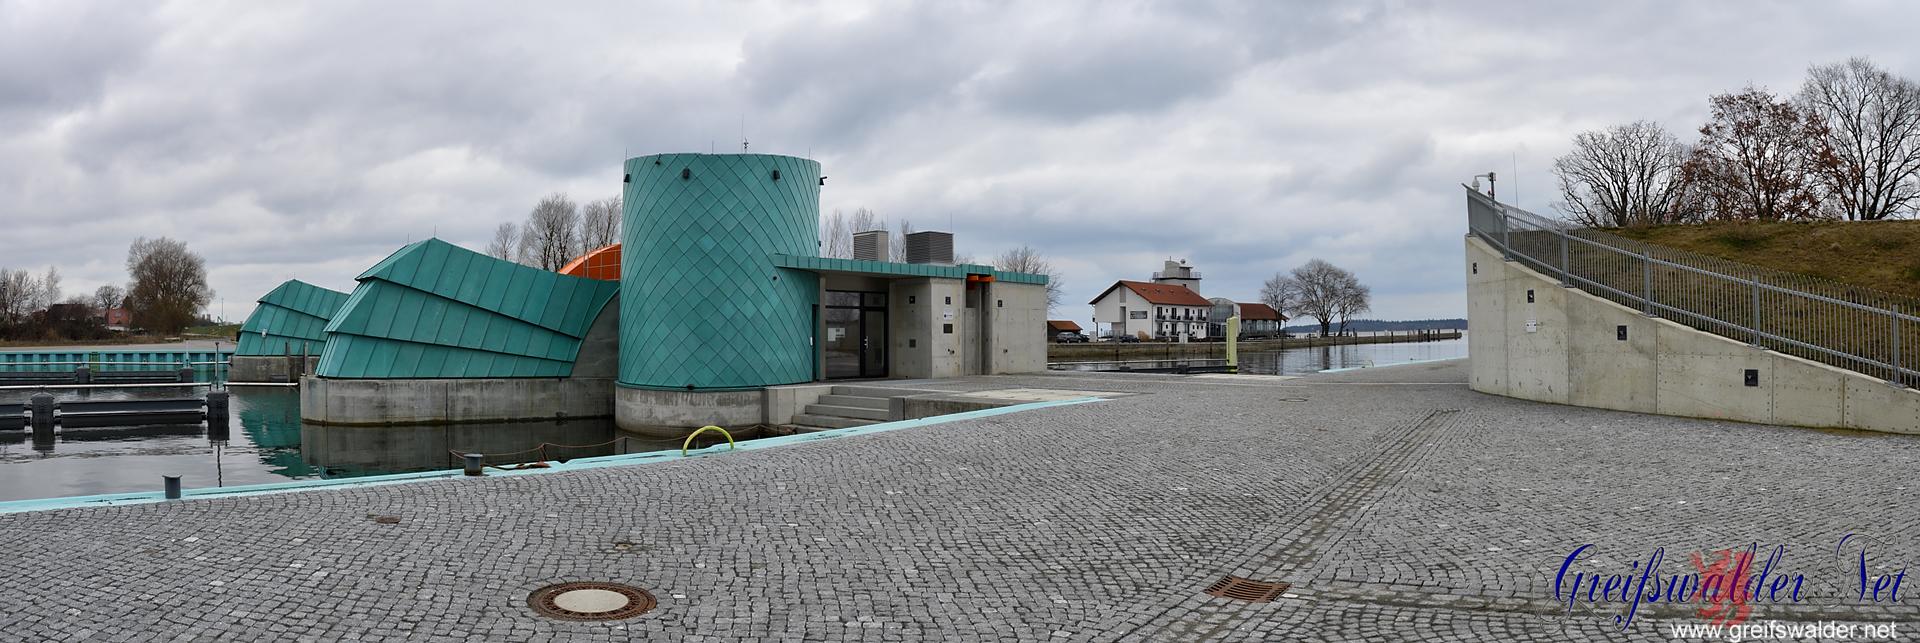 Sperrwerk und Utkiek in Greifswald-Wieck